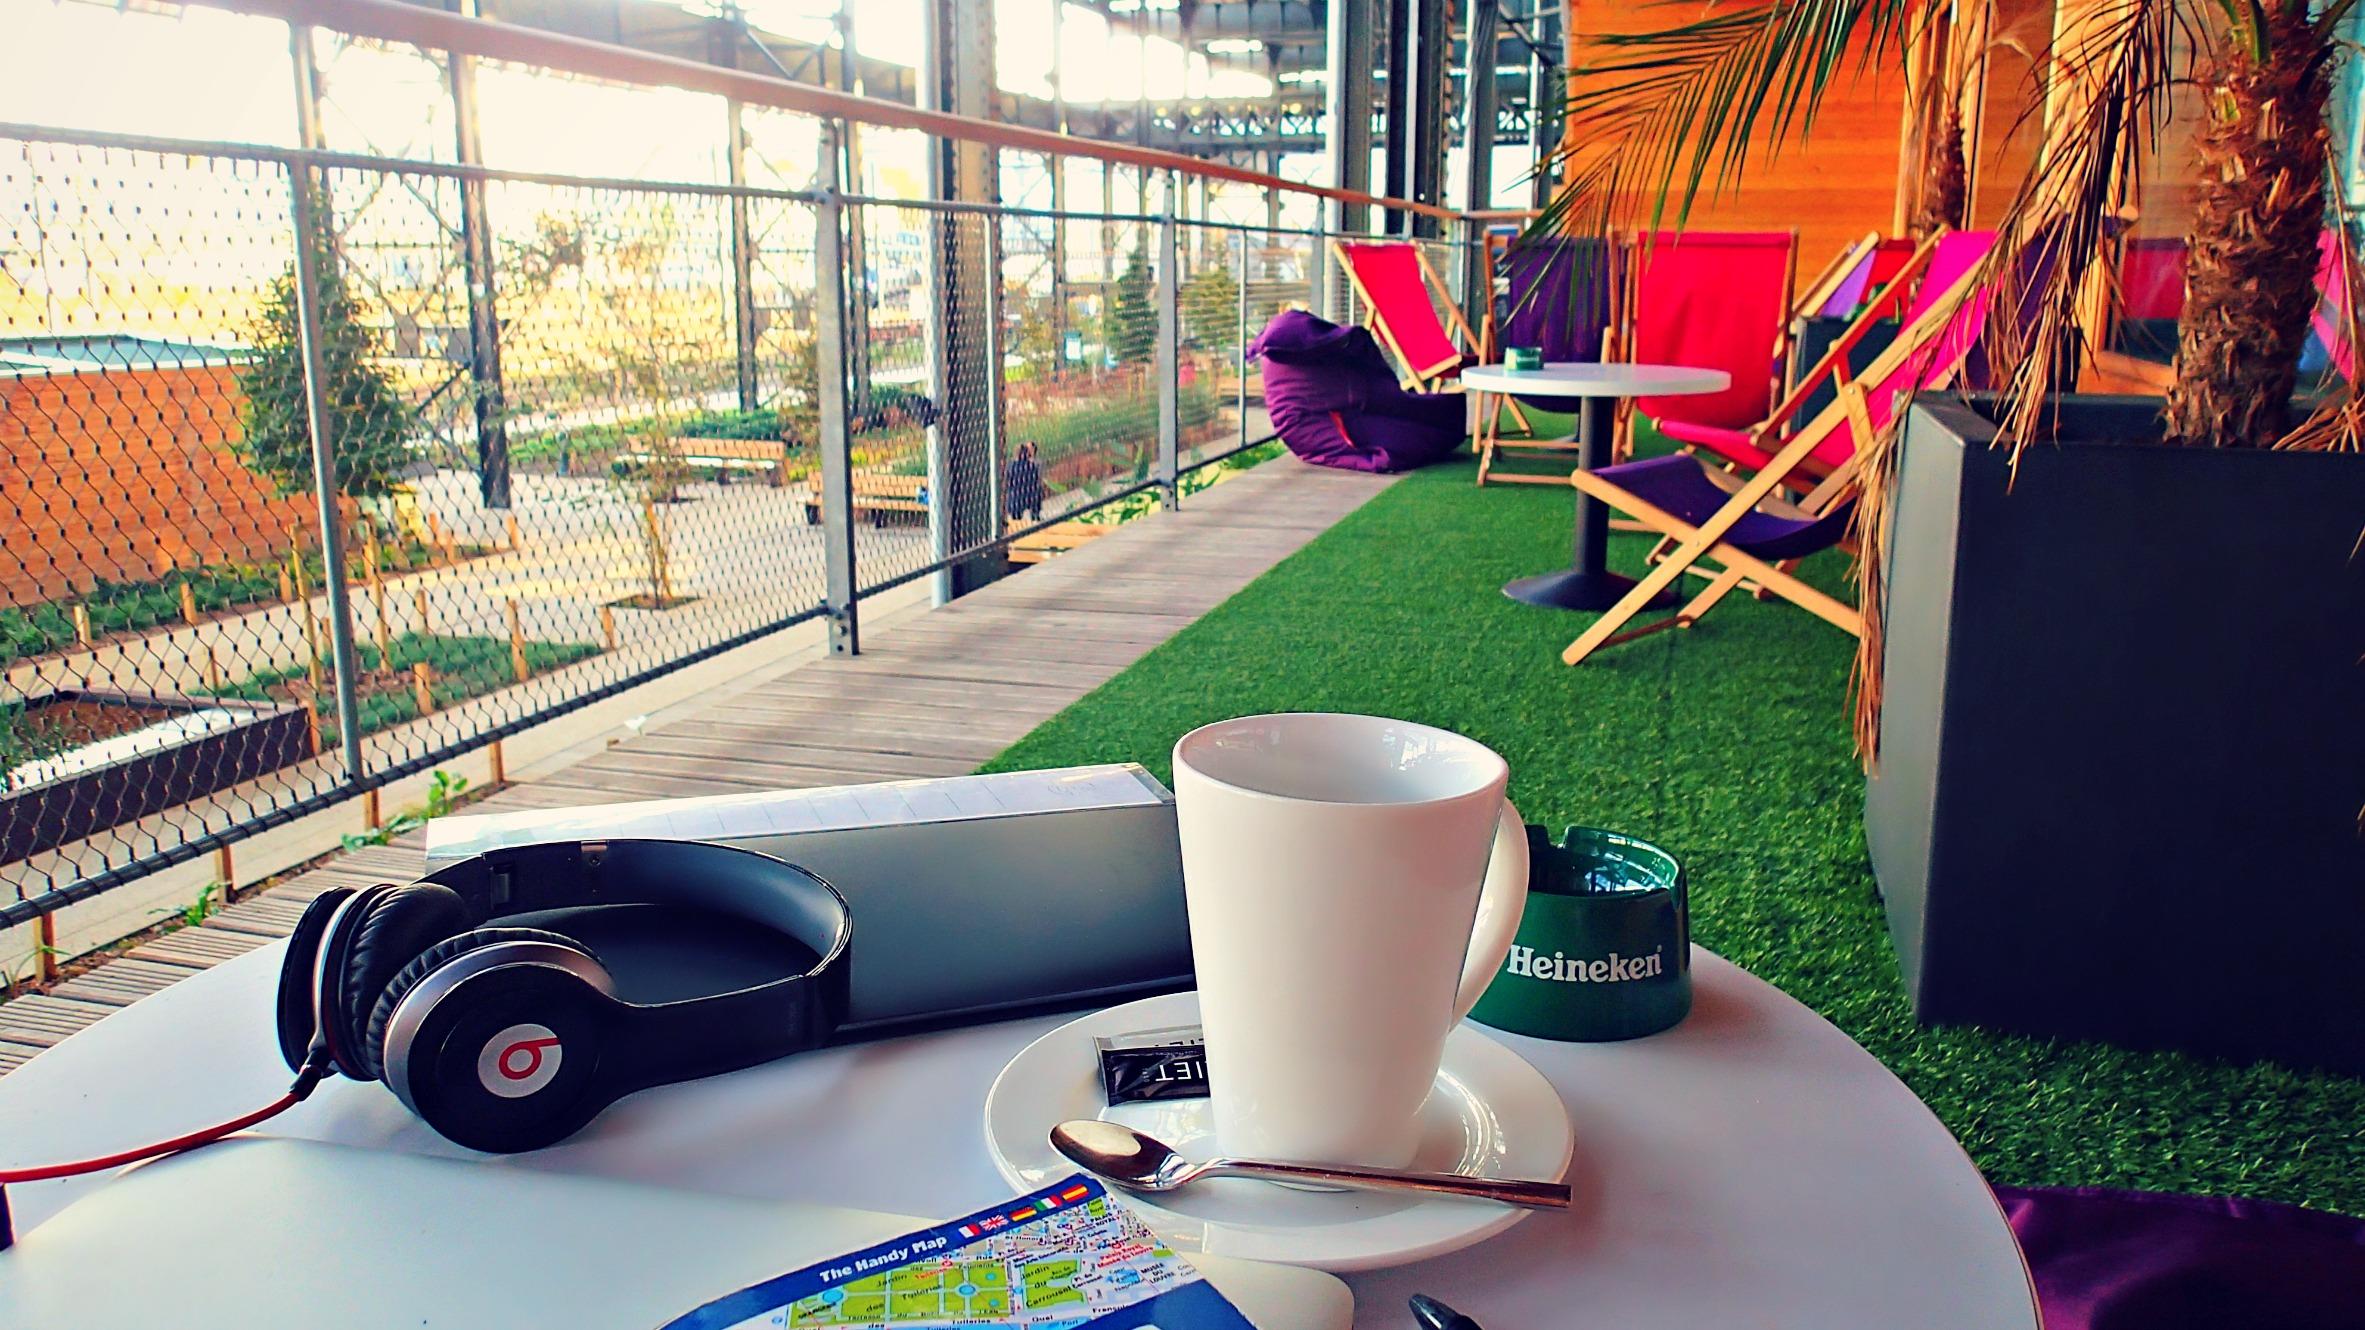 P10101771 Big Blog X: Breakfast at the Hostel!